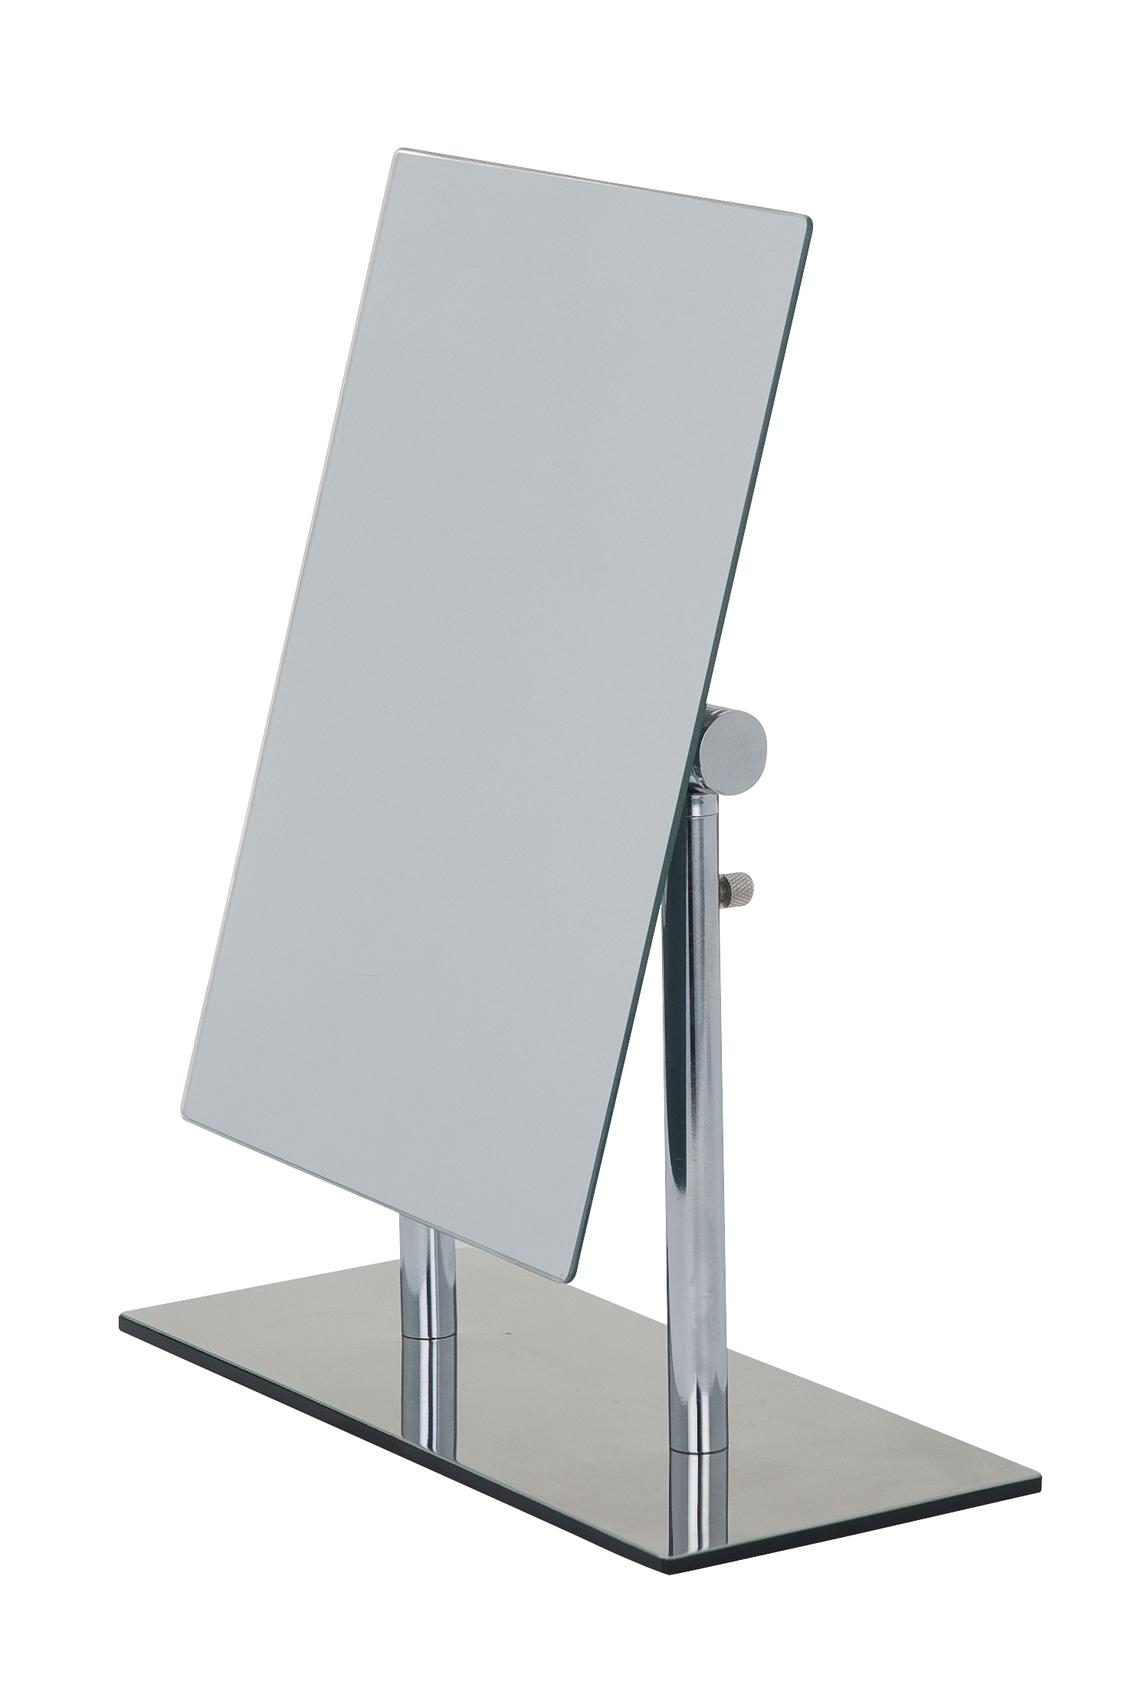 Oglinda cosmetica de masa, cu inaltimea reglabila, Pinerolo Crom, L23xl10xH27-35 cm poza